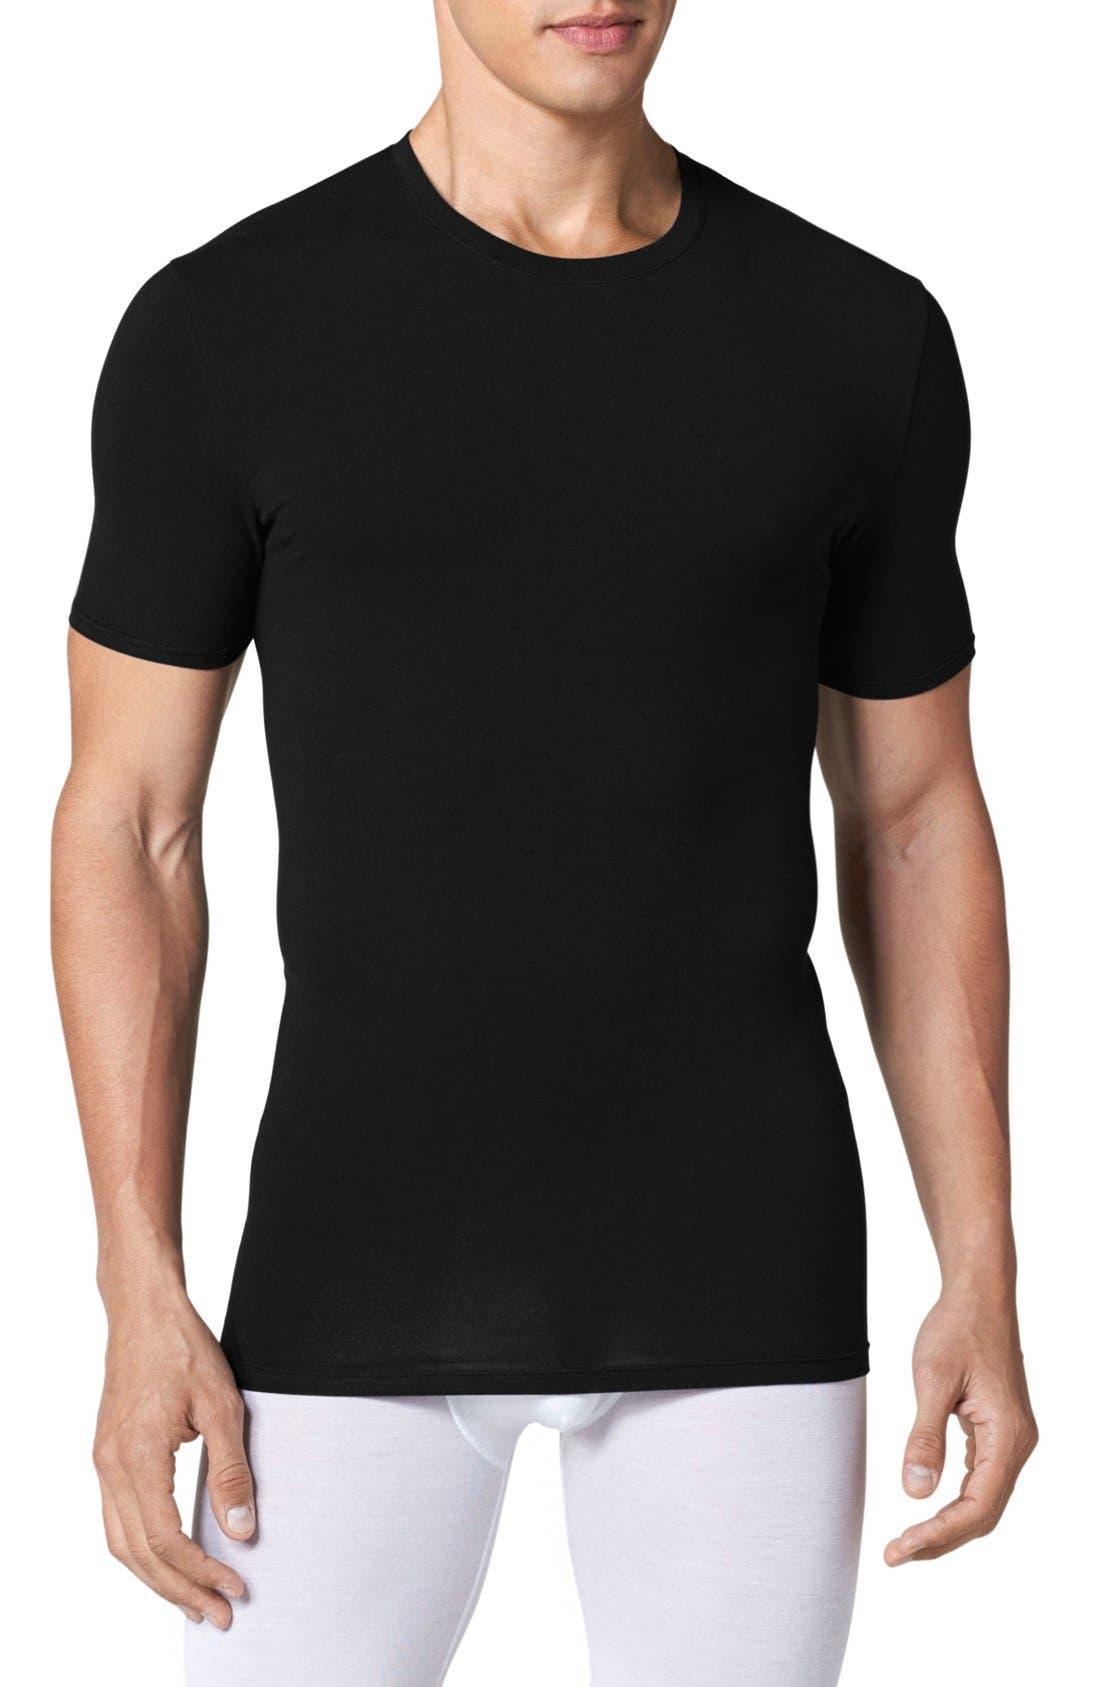 Alternate Image 1 Selected - Tommy John 'Cool Cotton' Crewneck Undershirt